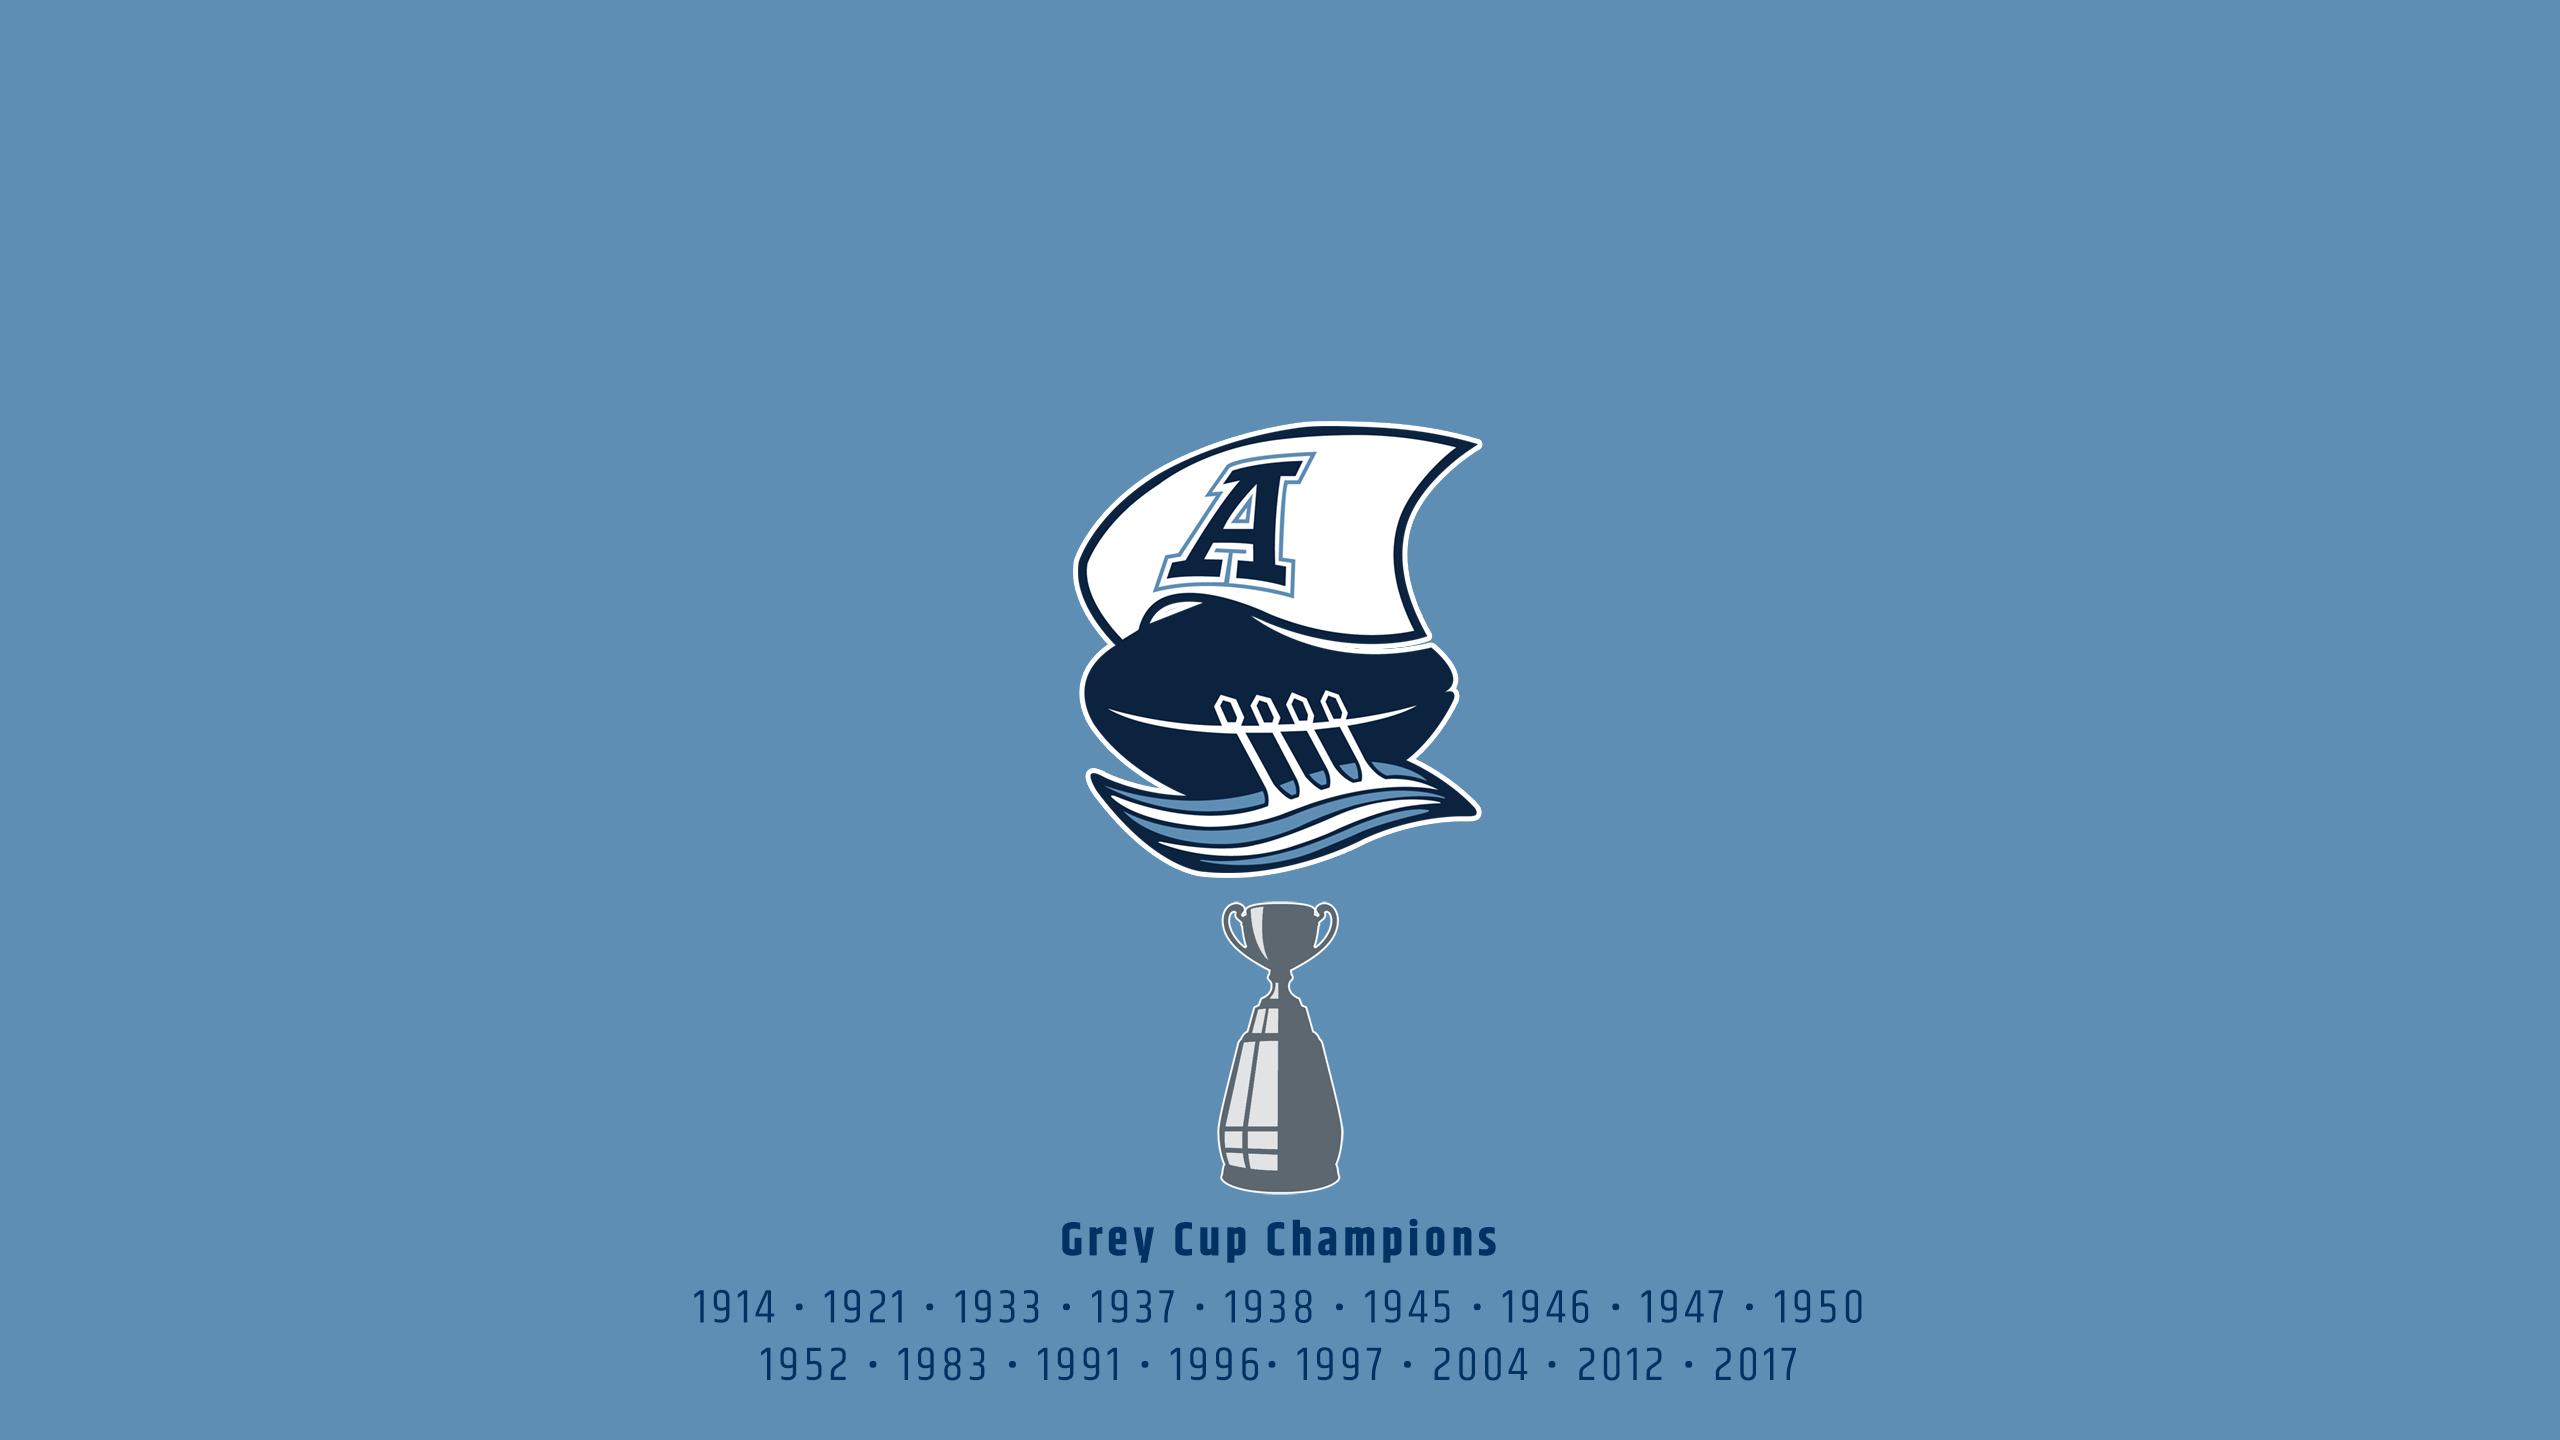 Toronto Argonauts - CFL Champs